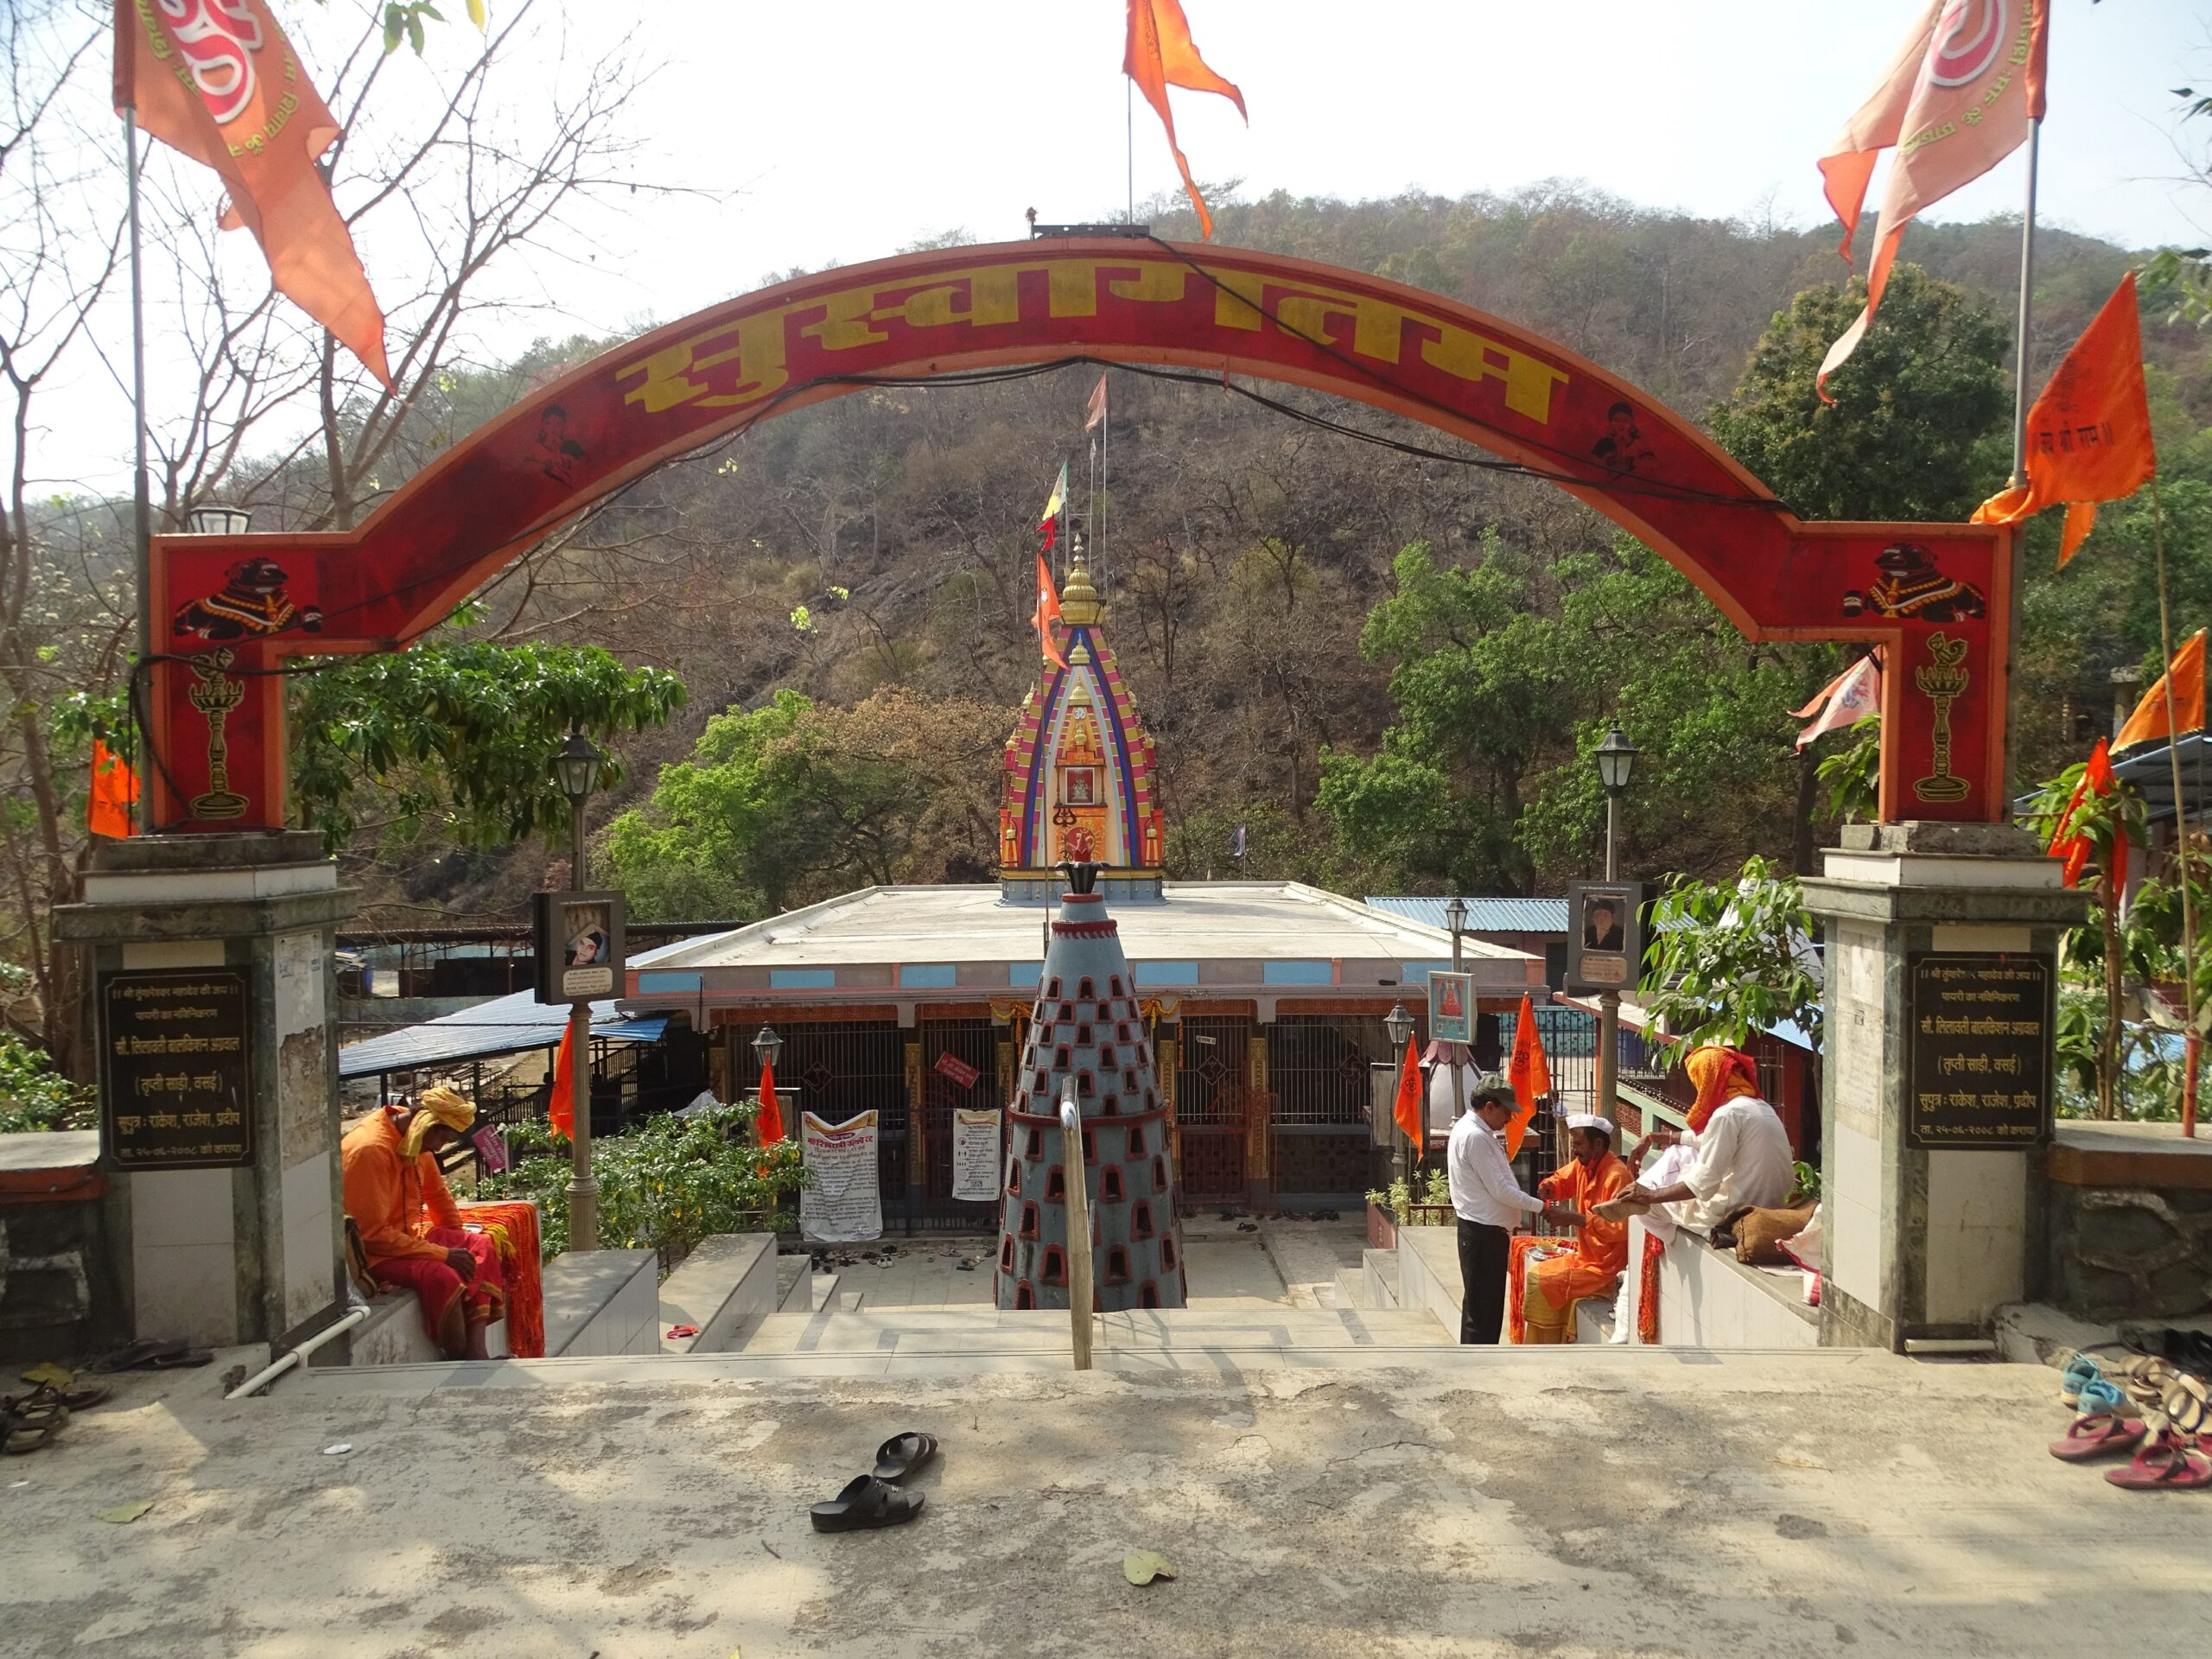 Entrance of Tungareshwar Temple (Vasai East, Palghar, Maharashtra, India)